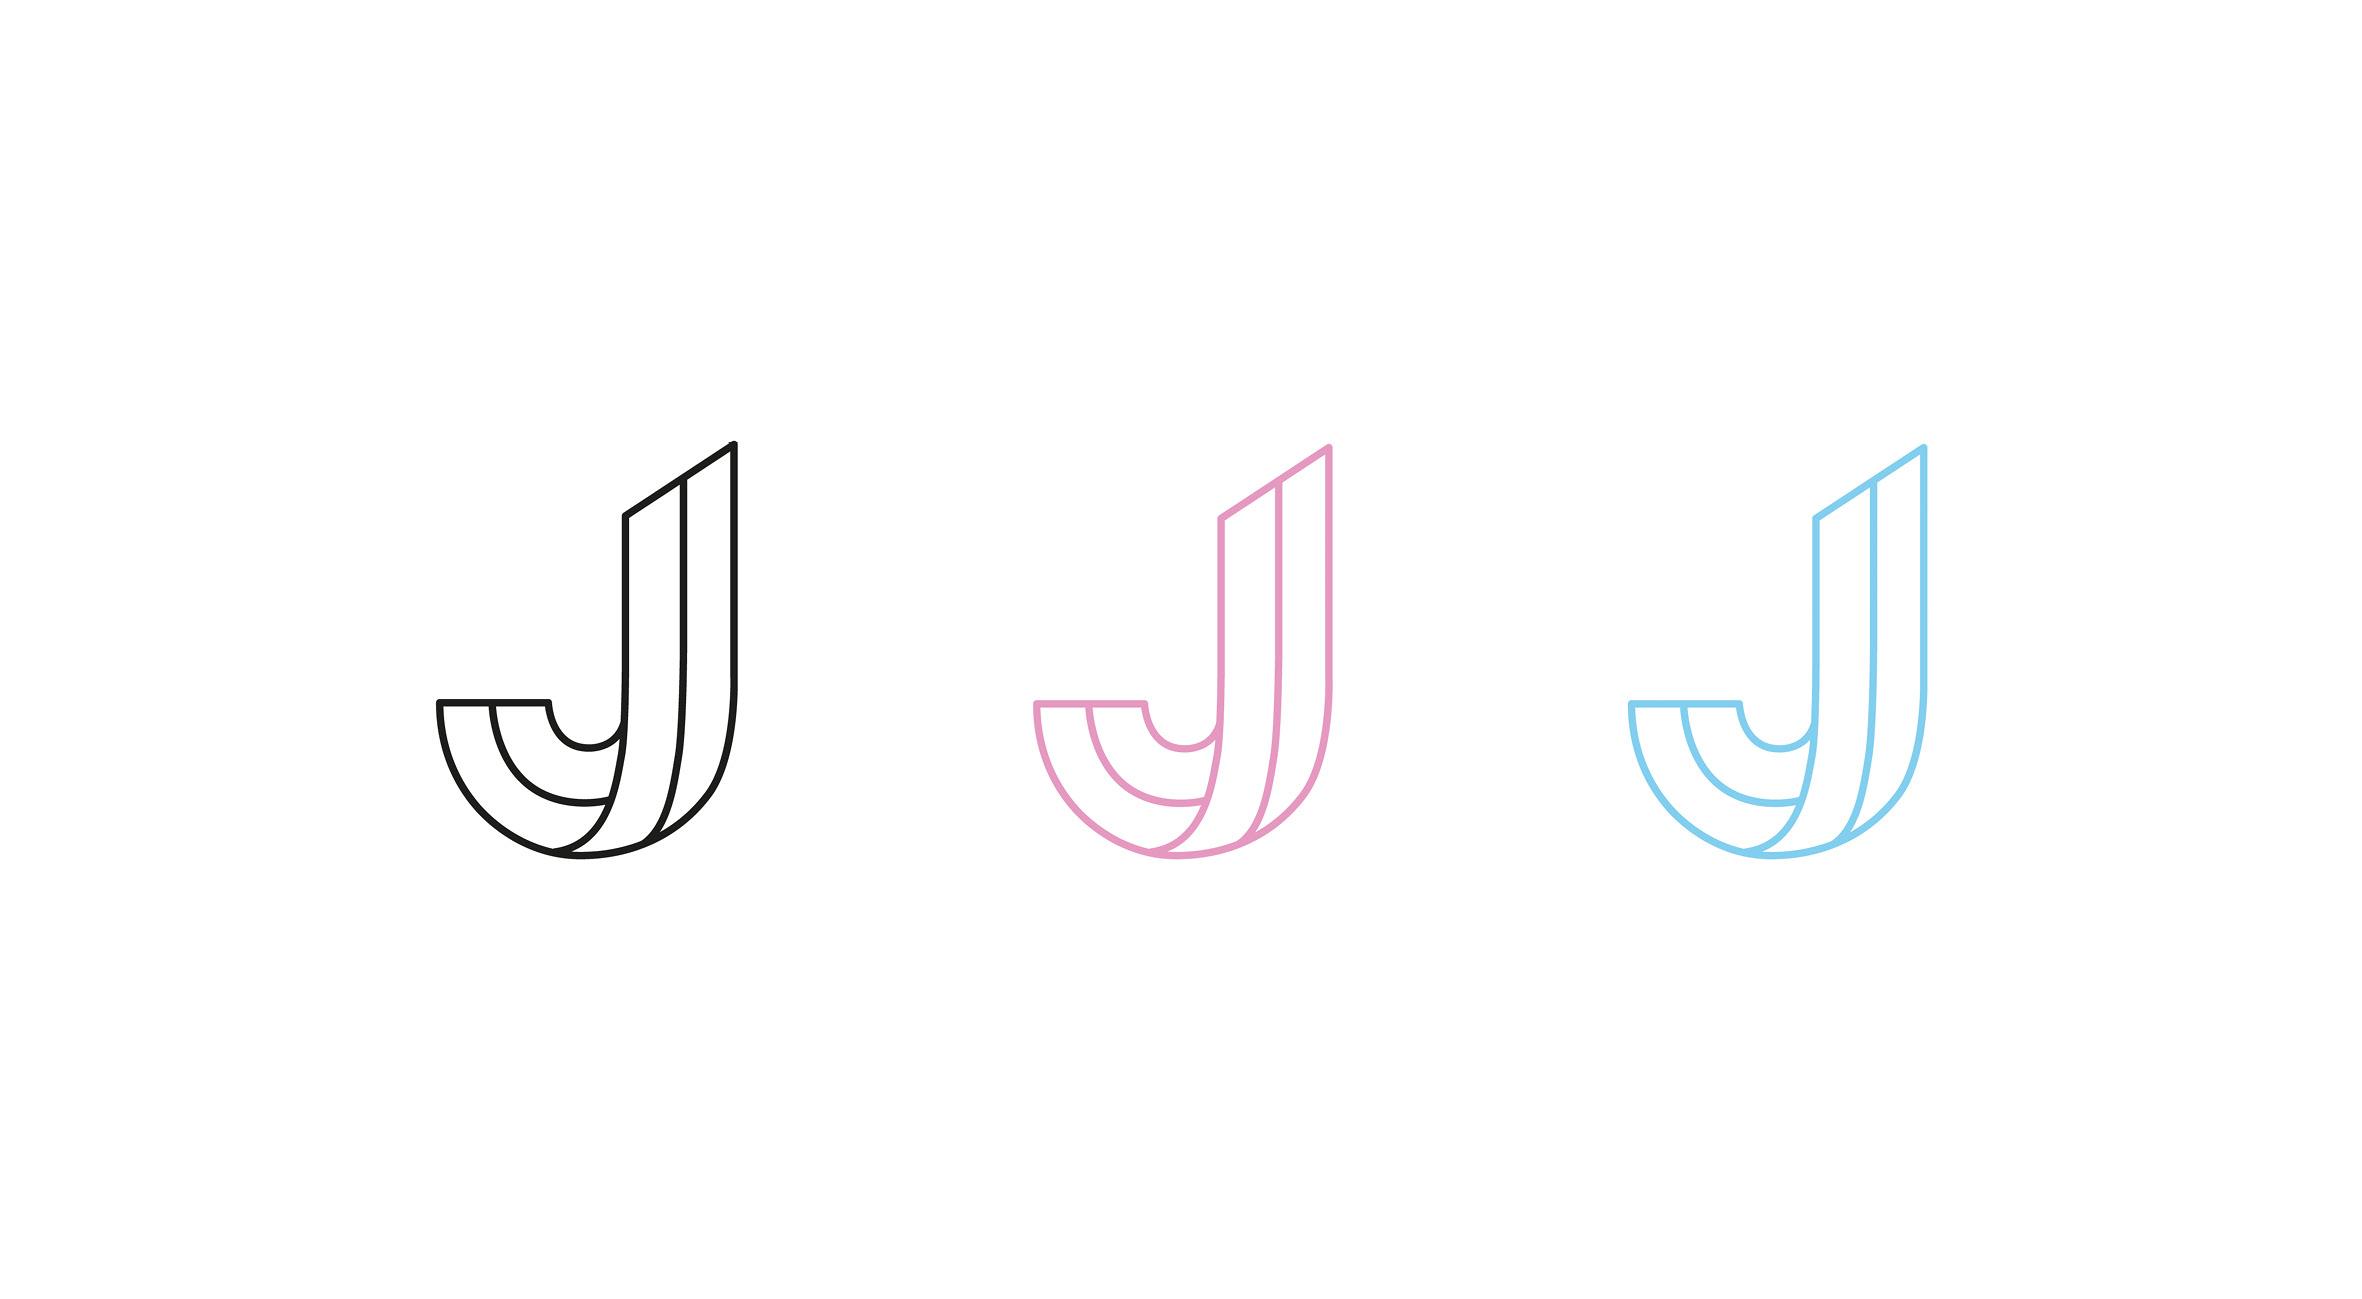 Personal branding images2.jpg